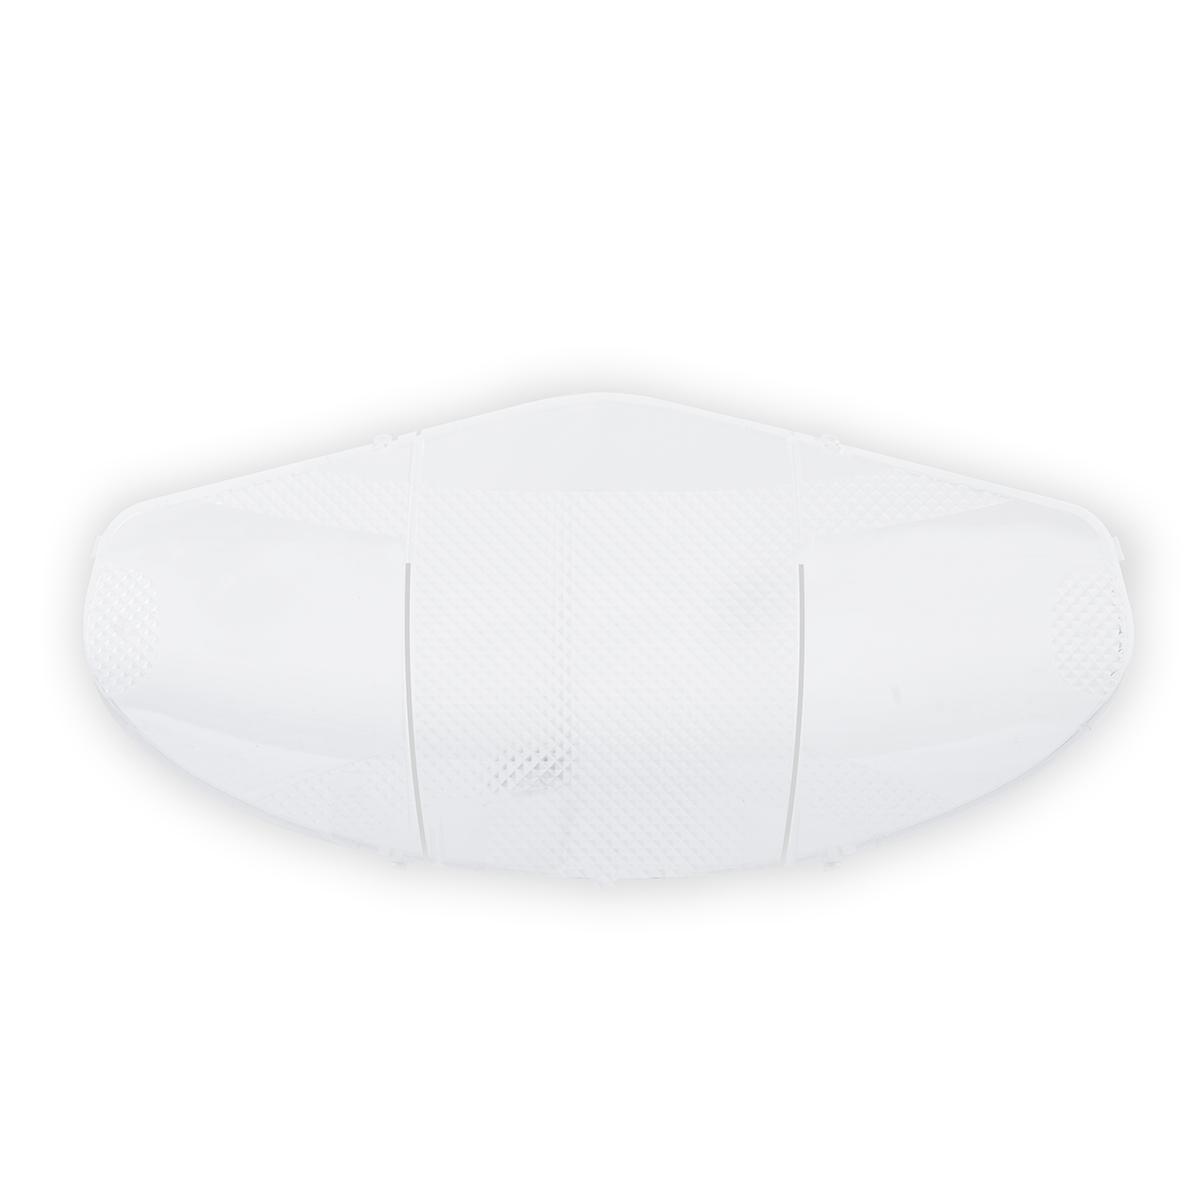 67772 Small Dome Light Lens for Freightliner Cascadia